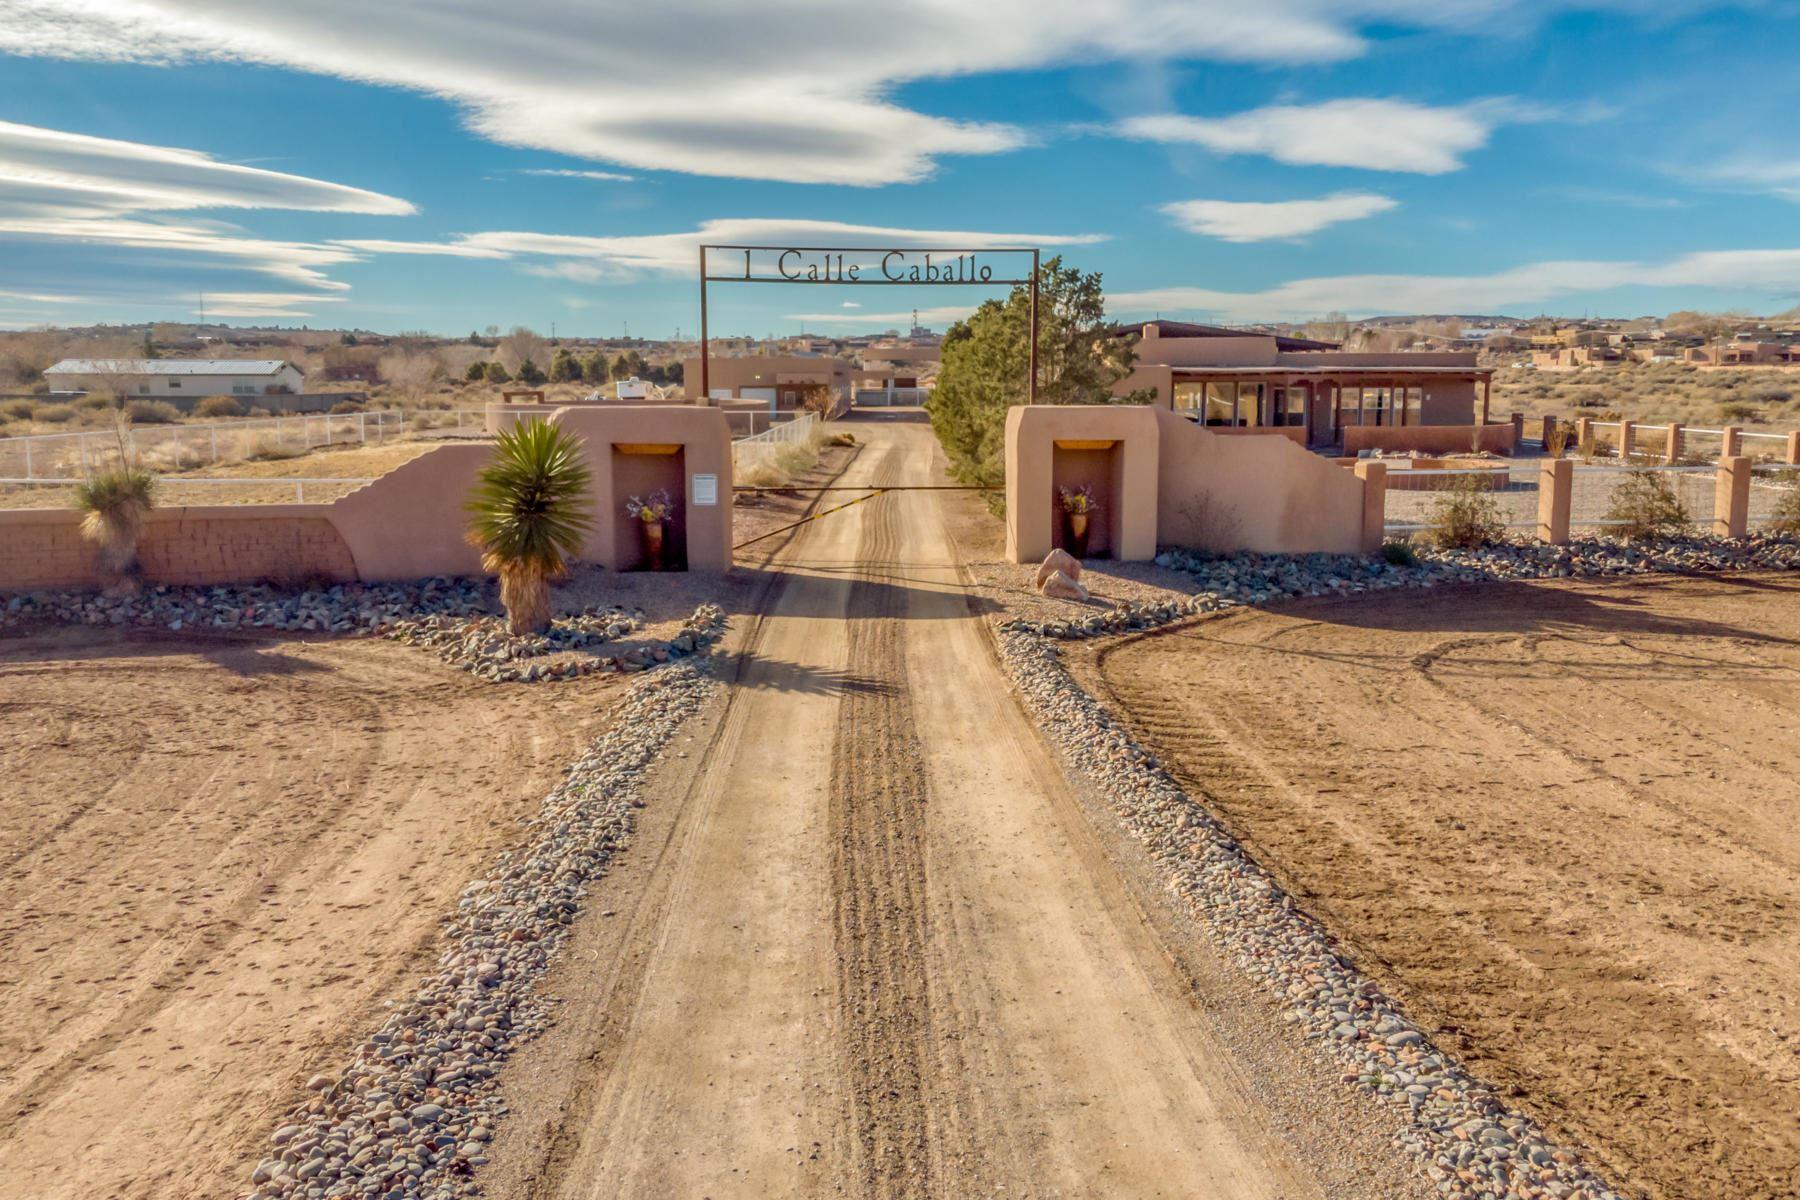 Photo of 1 CALLE CABALLO, Corrales, NM 87048 (MLS # 982686)